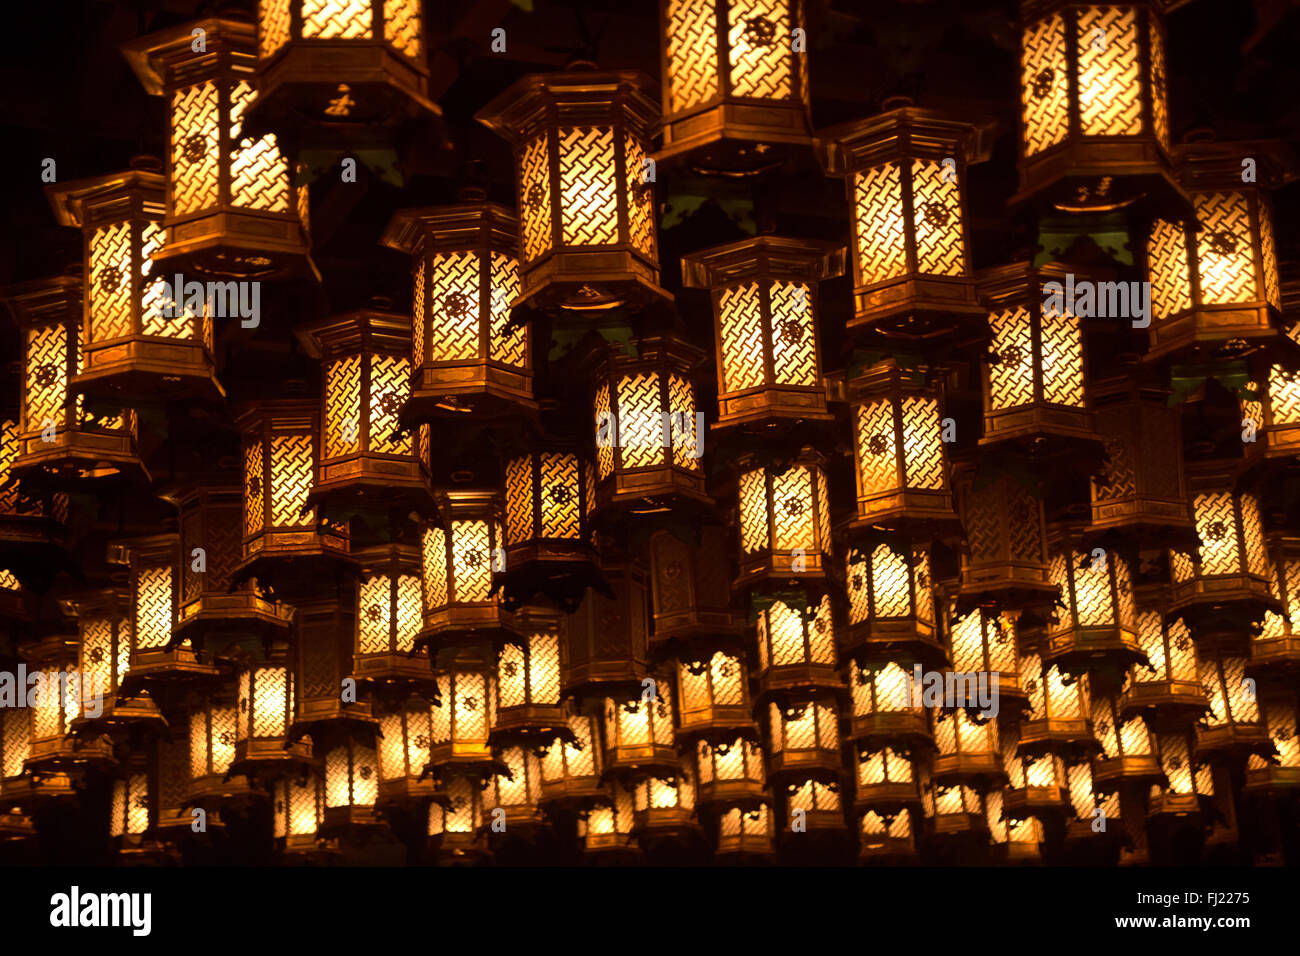 Die Dekoration im Inneren des Daiganji Tempel, Miyajima, Japan Stockbild